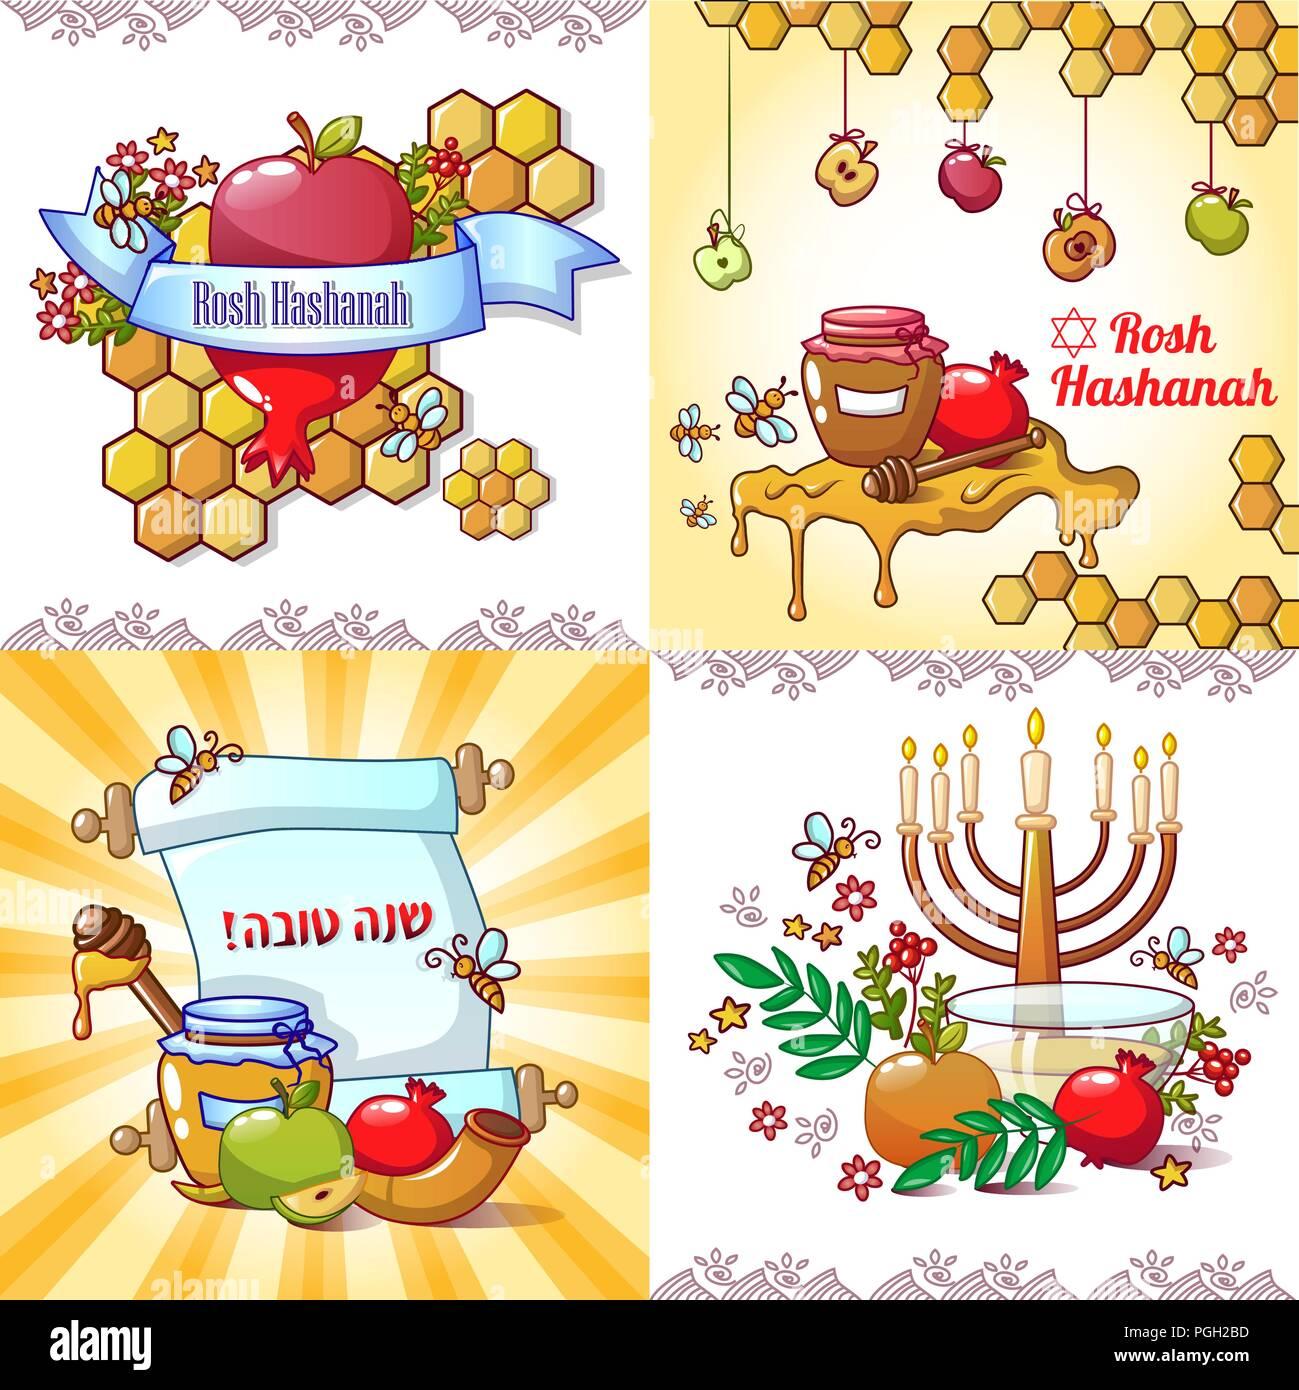 Rosh Hashanah banner concept set, cartoon style - Stock Vector